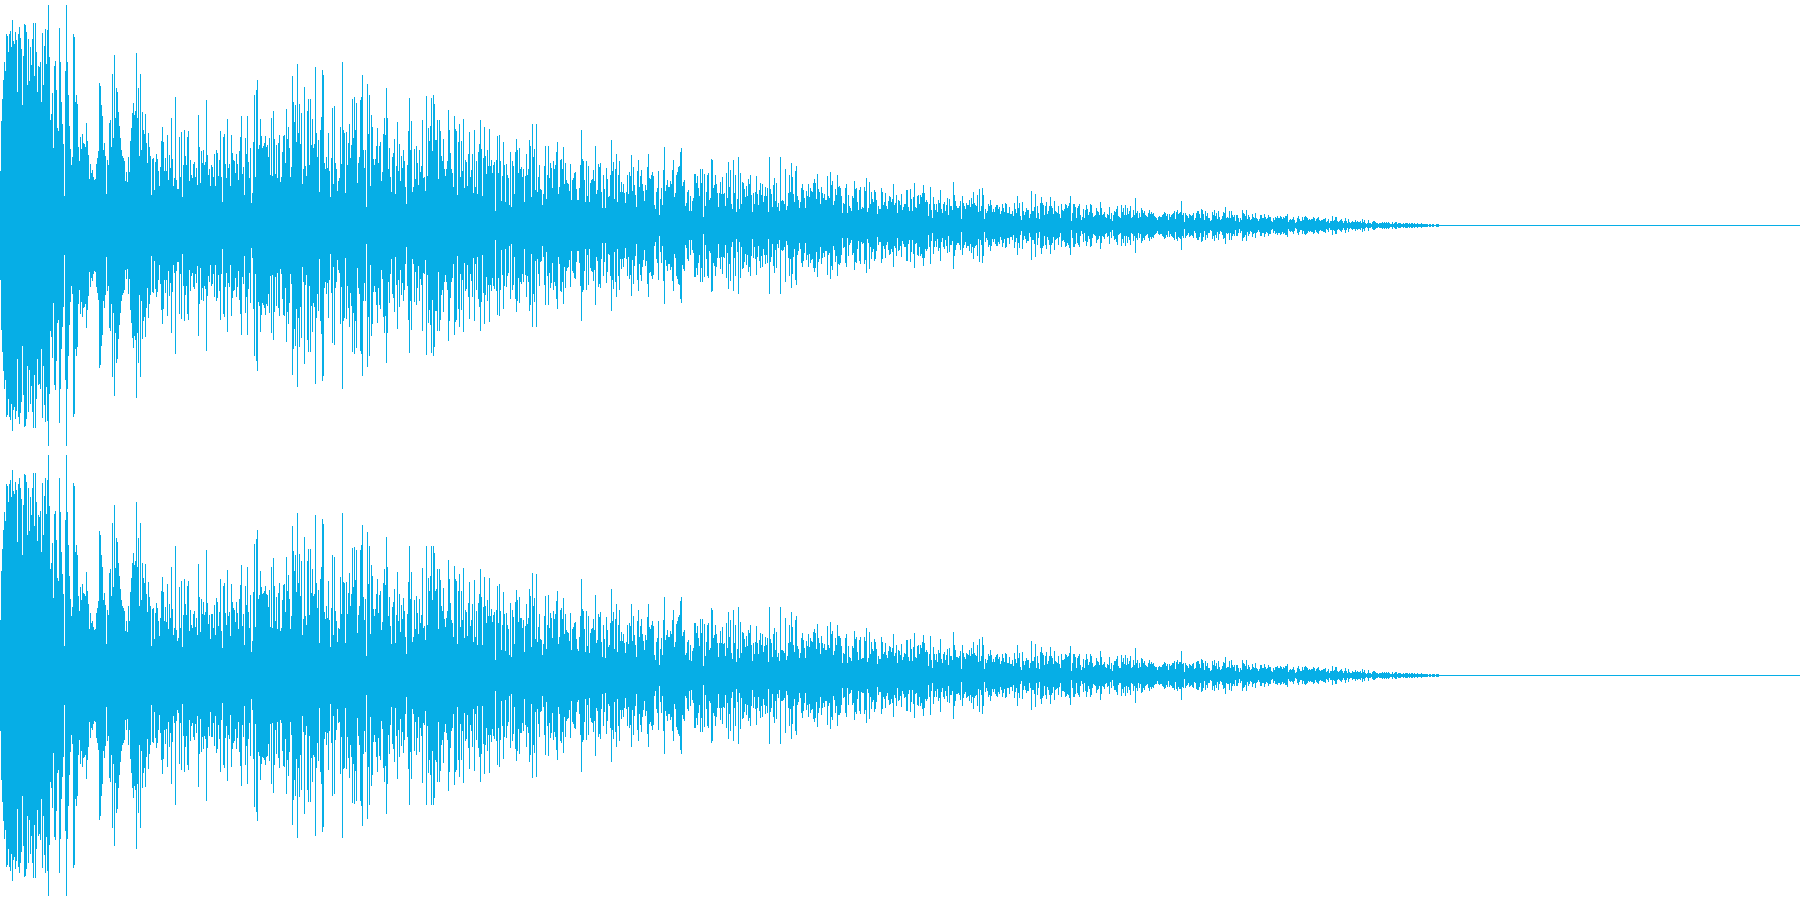 DTM Snare 4 オリジナル音源の再生済みの波形